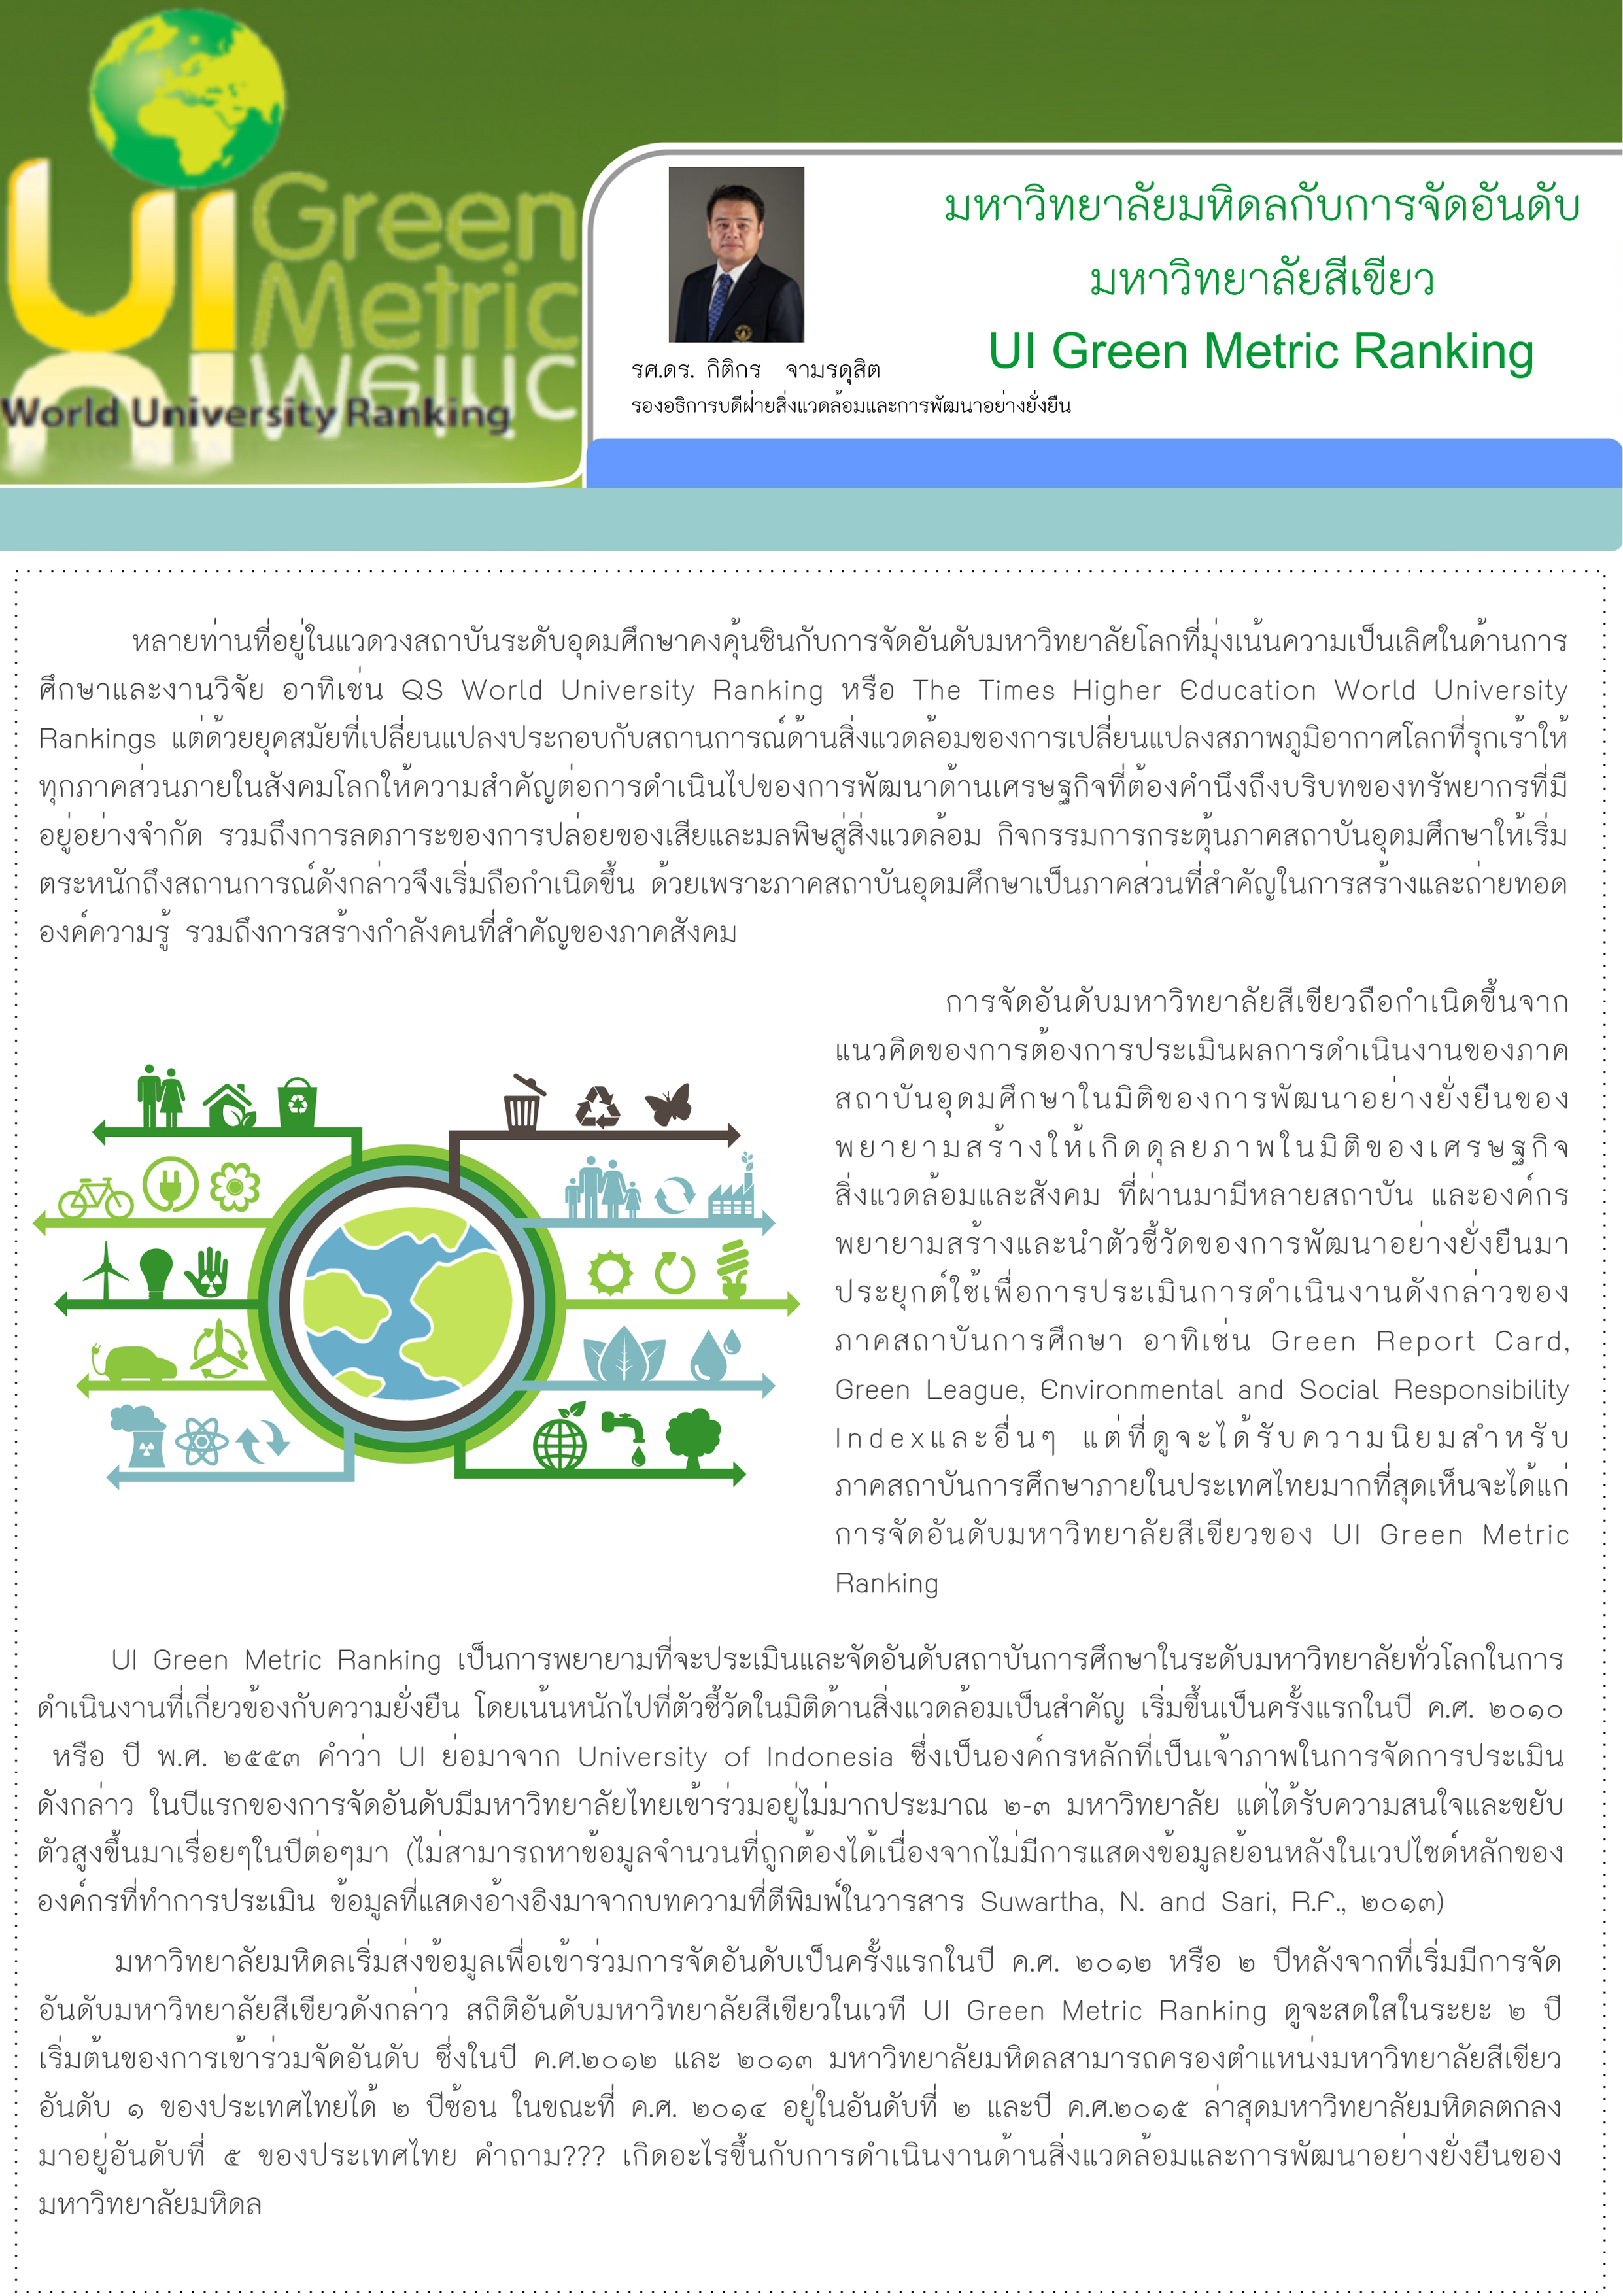 Article-UI Green Metric Ranking